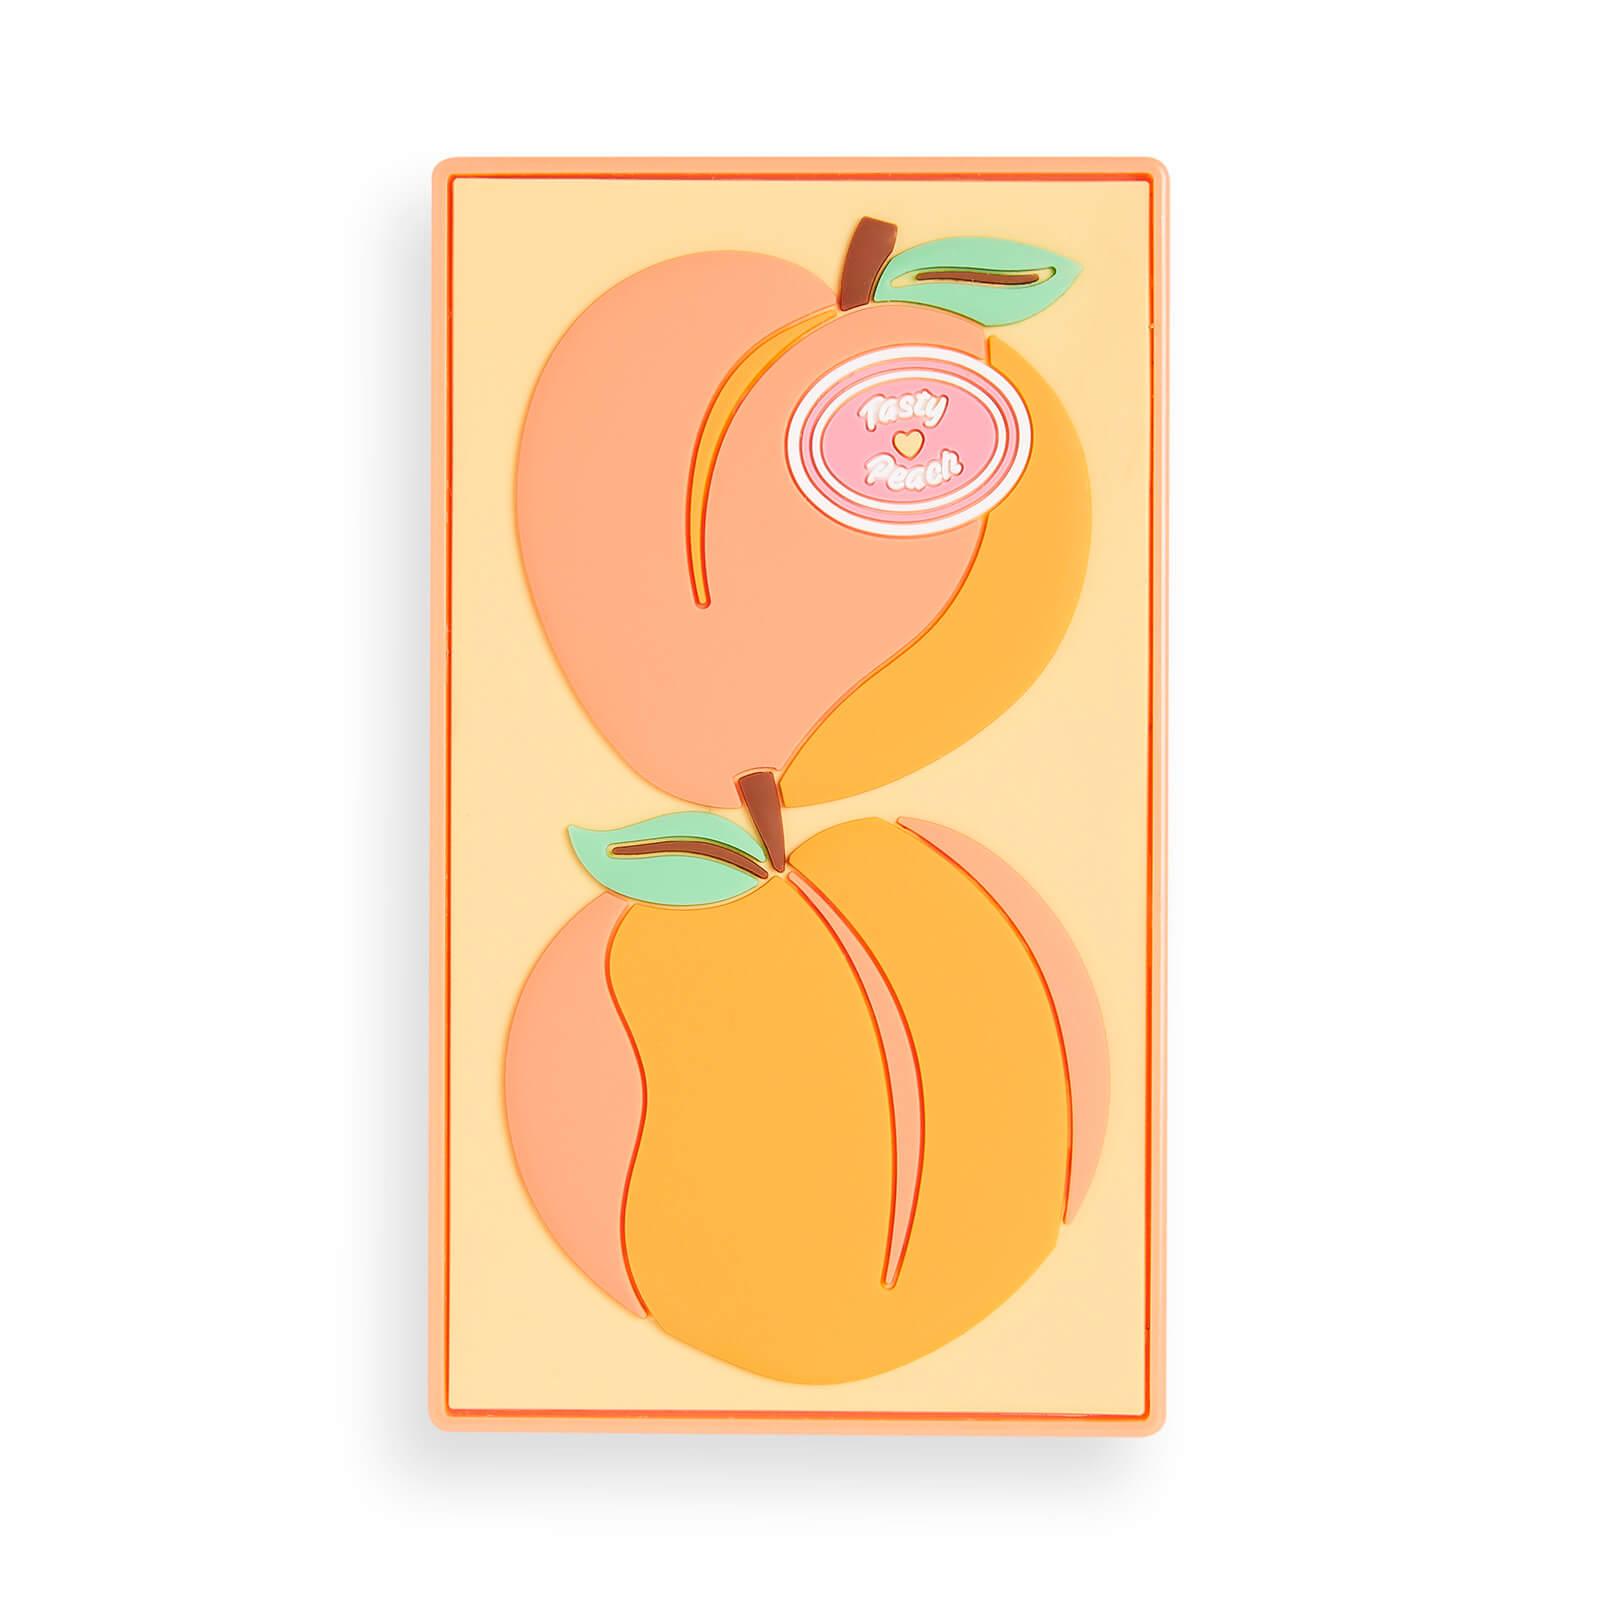 Купить Revolution I Heart Revolution Mini Tasty Eye Shadow Palette - Peach